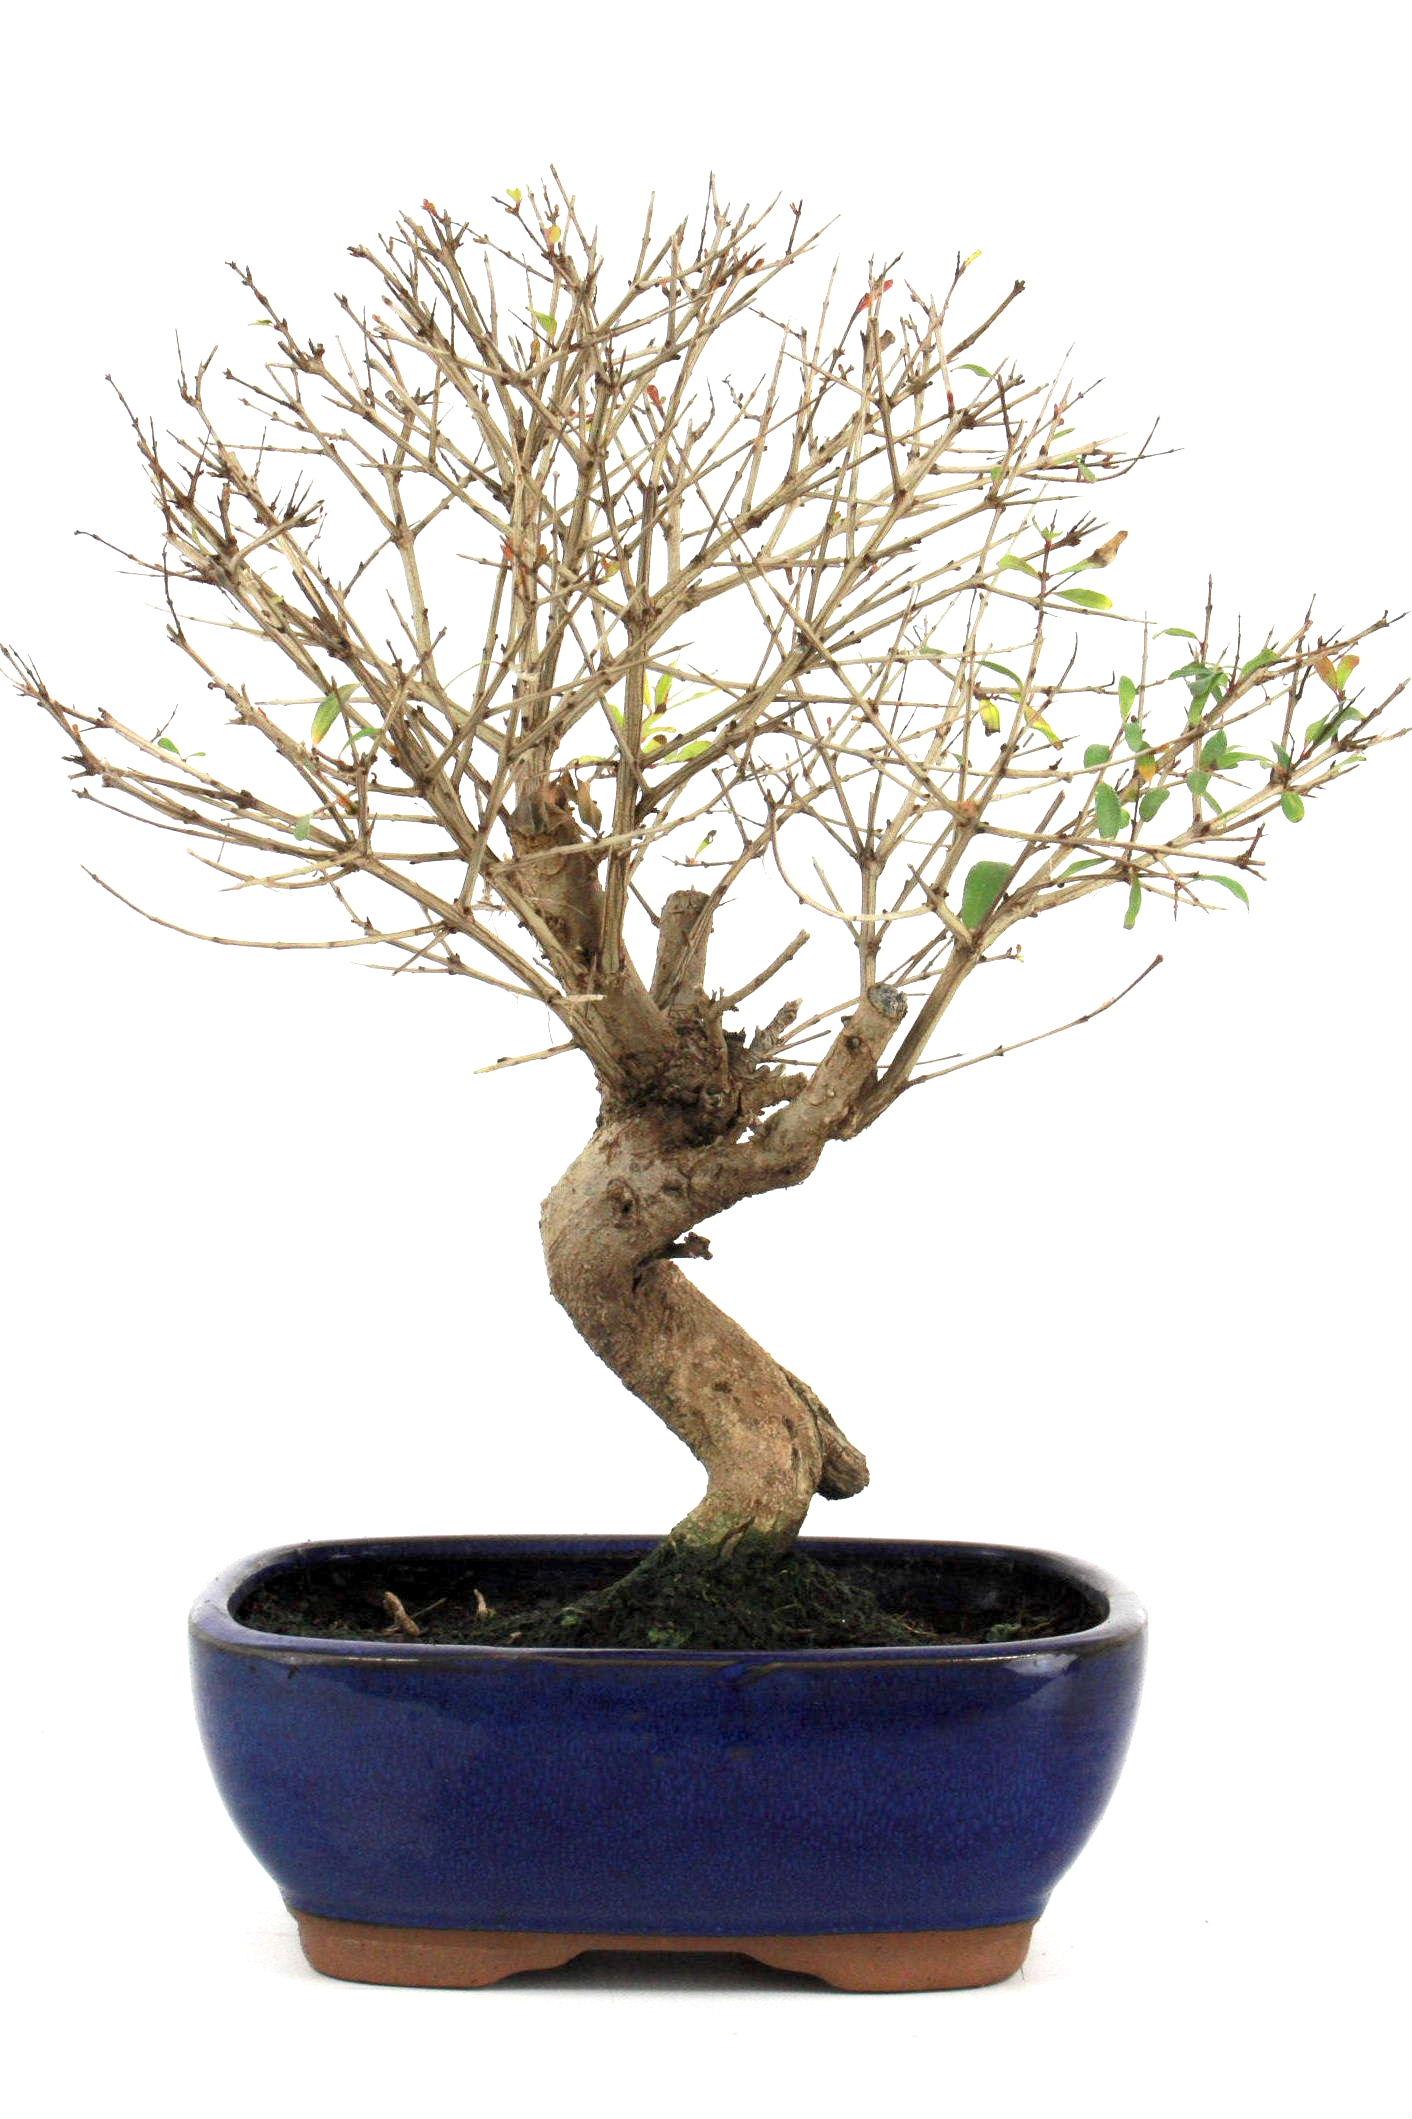 bonsai granatapfel 35 40 cm 1924 bei oyaki bonsai kaufen. Black Bedroom Furniture Sets. Home Design Ideas